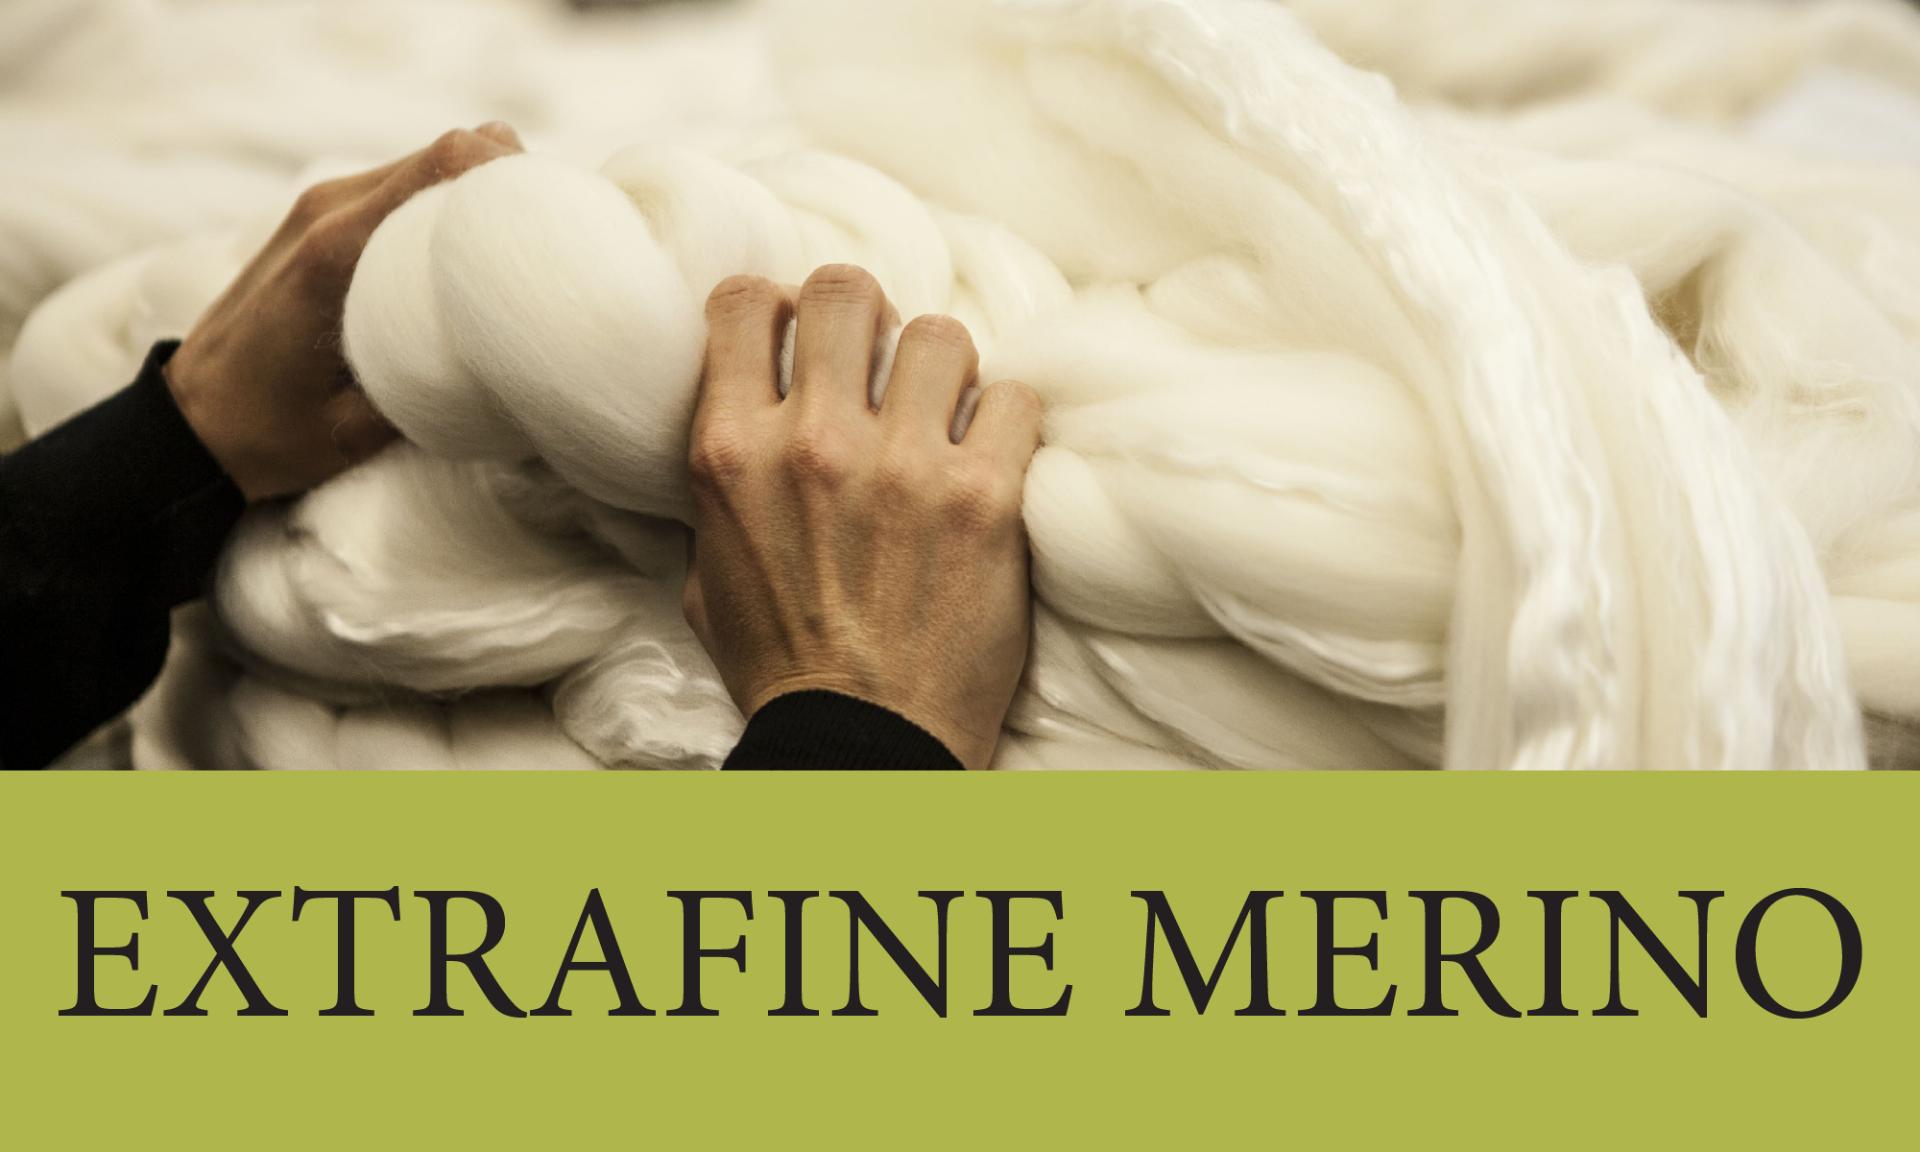 Extrafine Merino Yarn